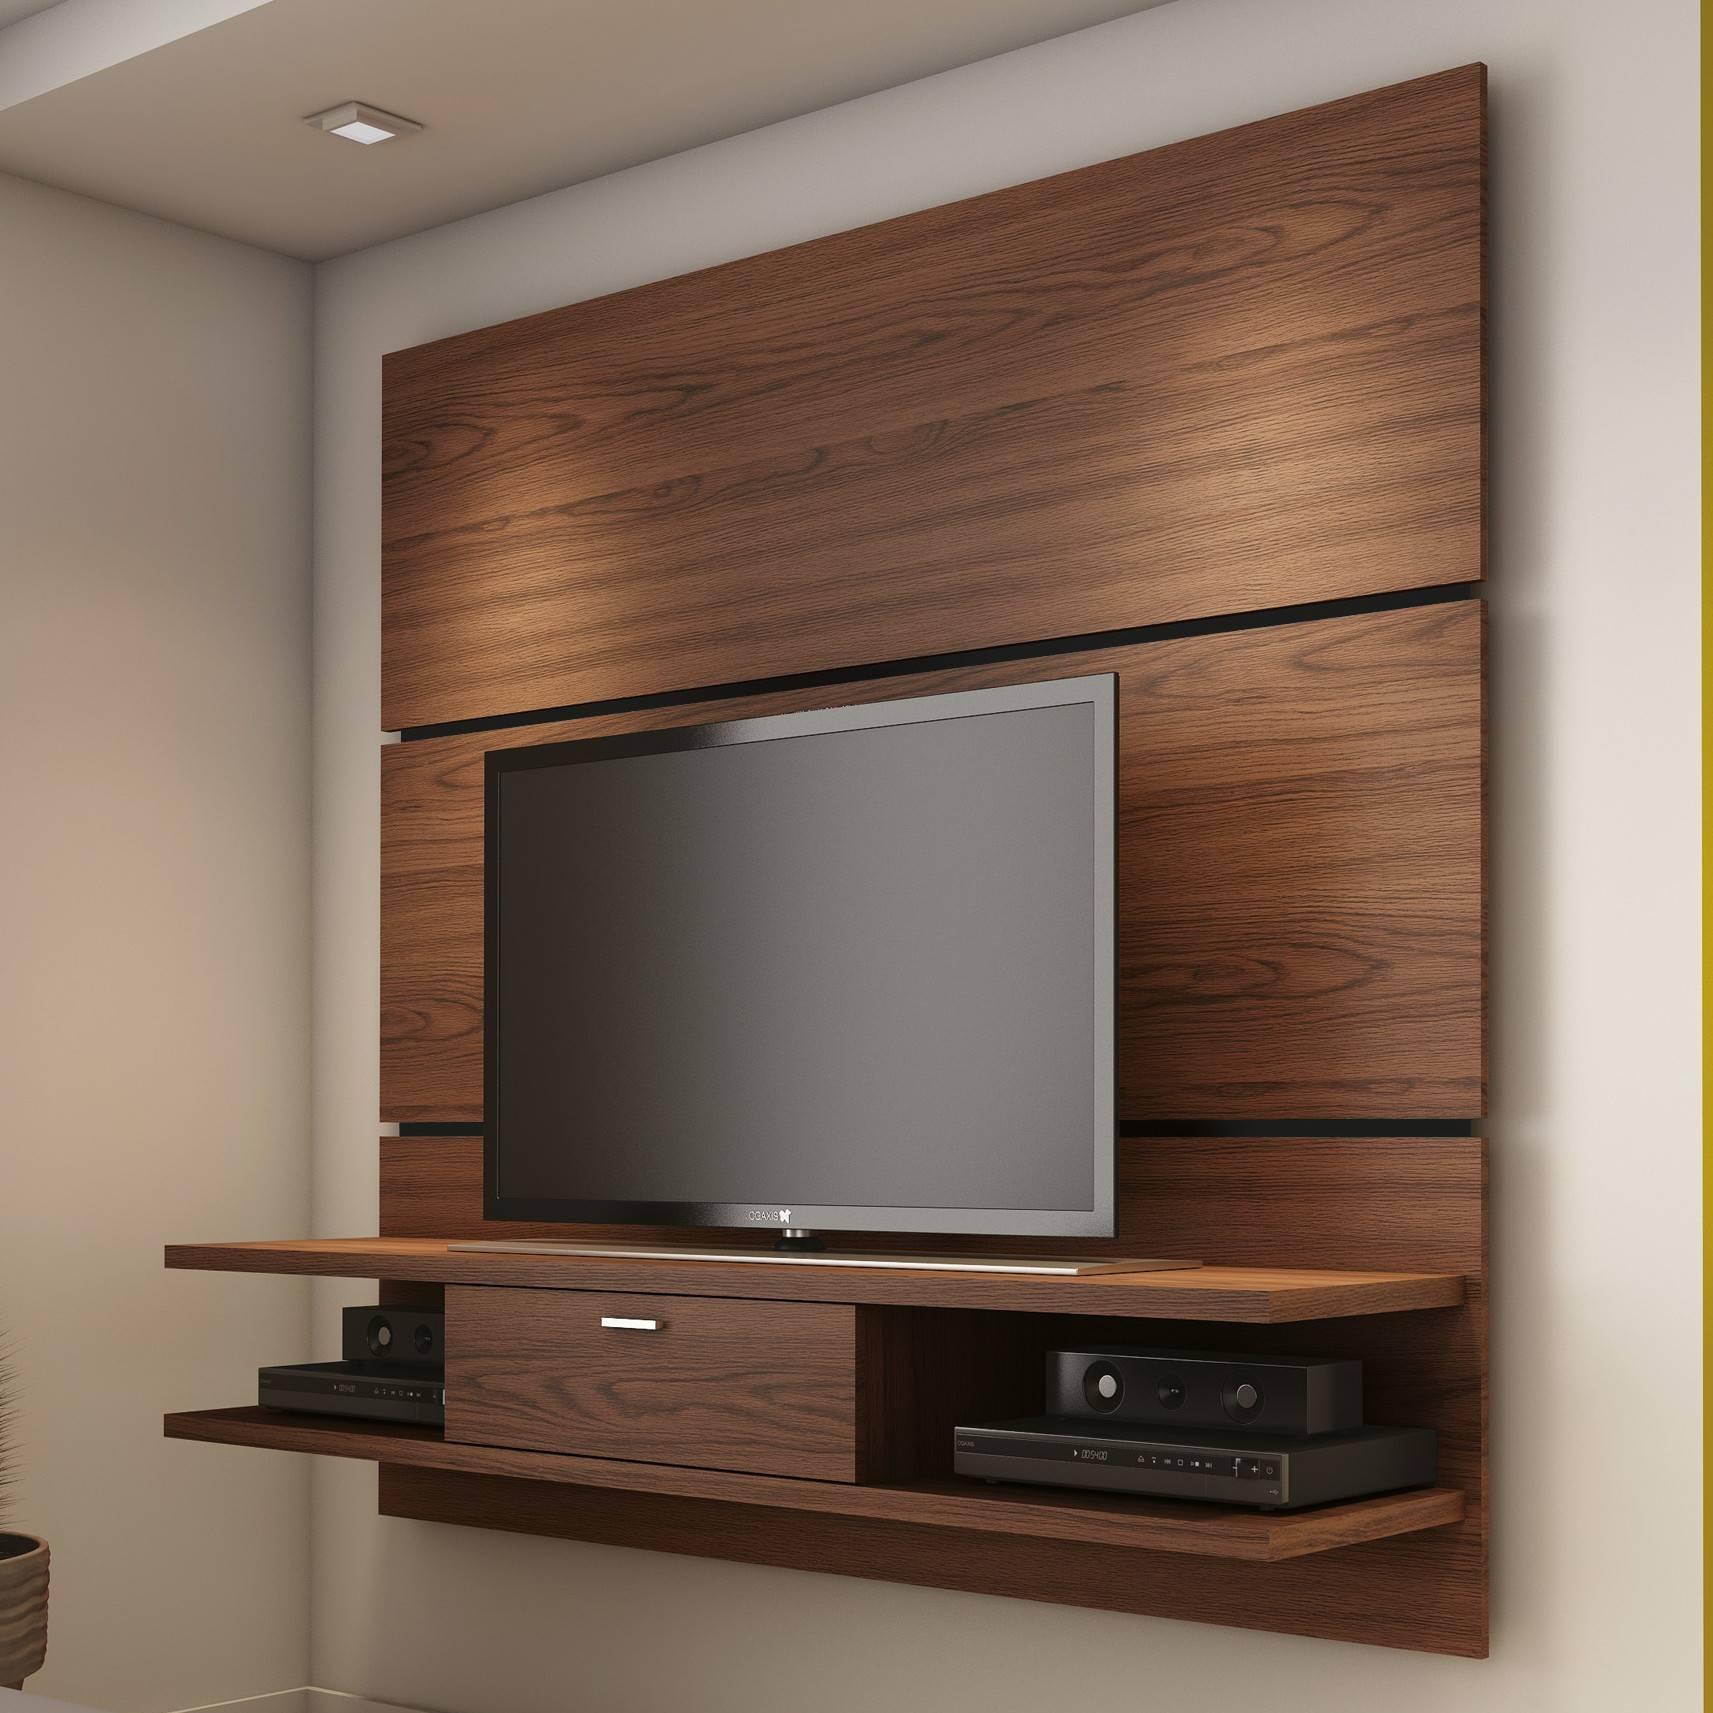 Wall Units: Astonishing Wall Display Units & Tv Cabinets Outdoor regarding Tv Cabinets and Wall Units (Image 14 of 15)